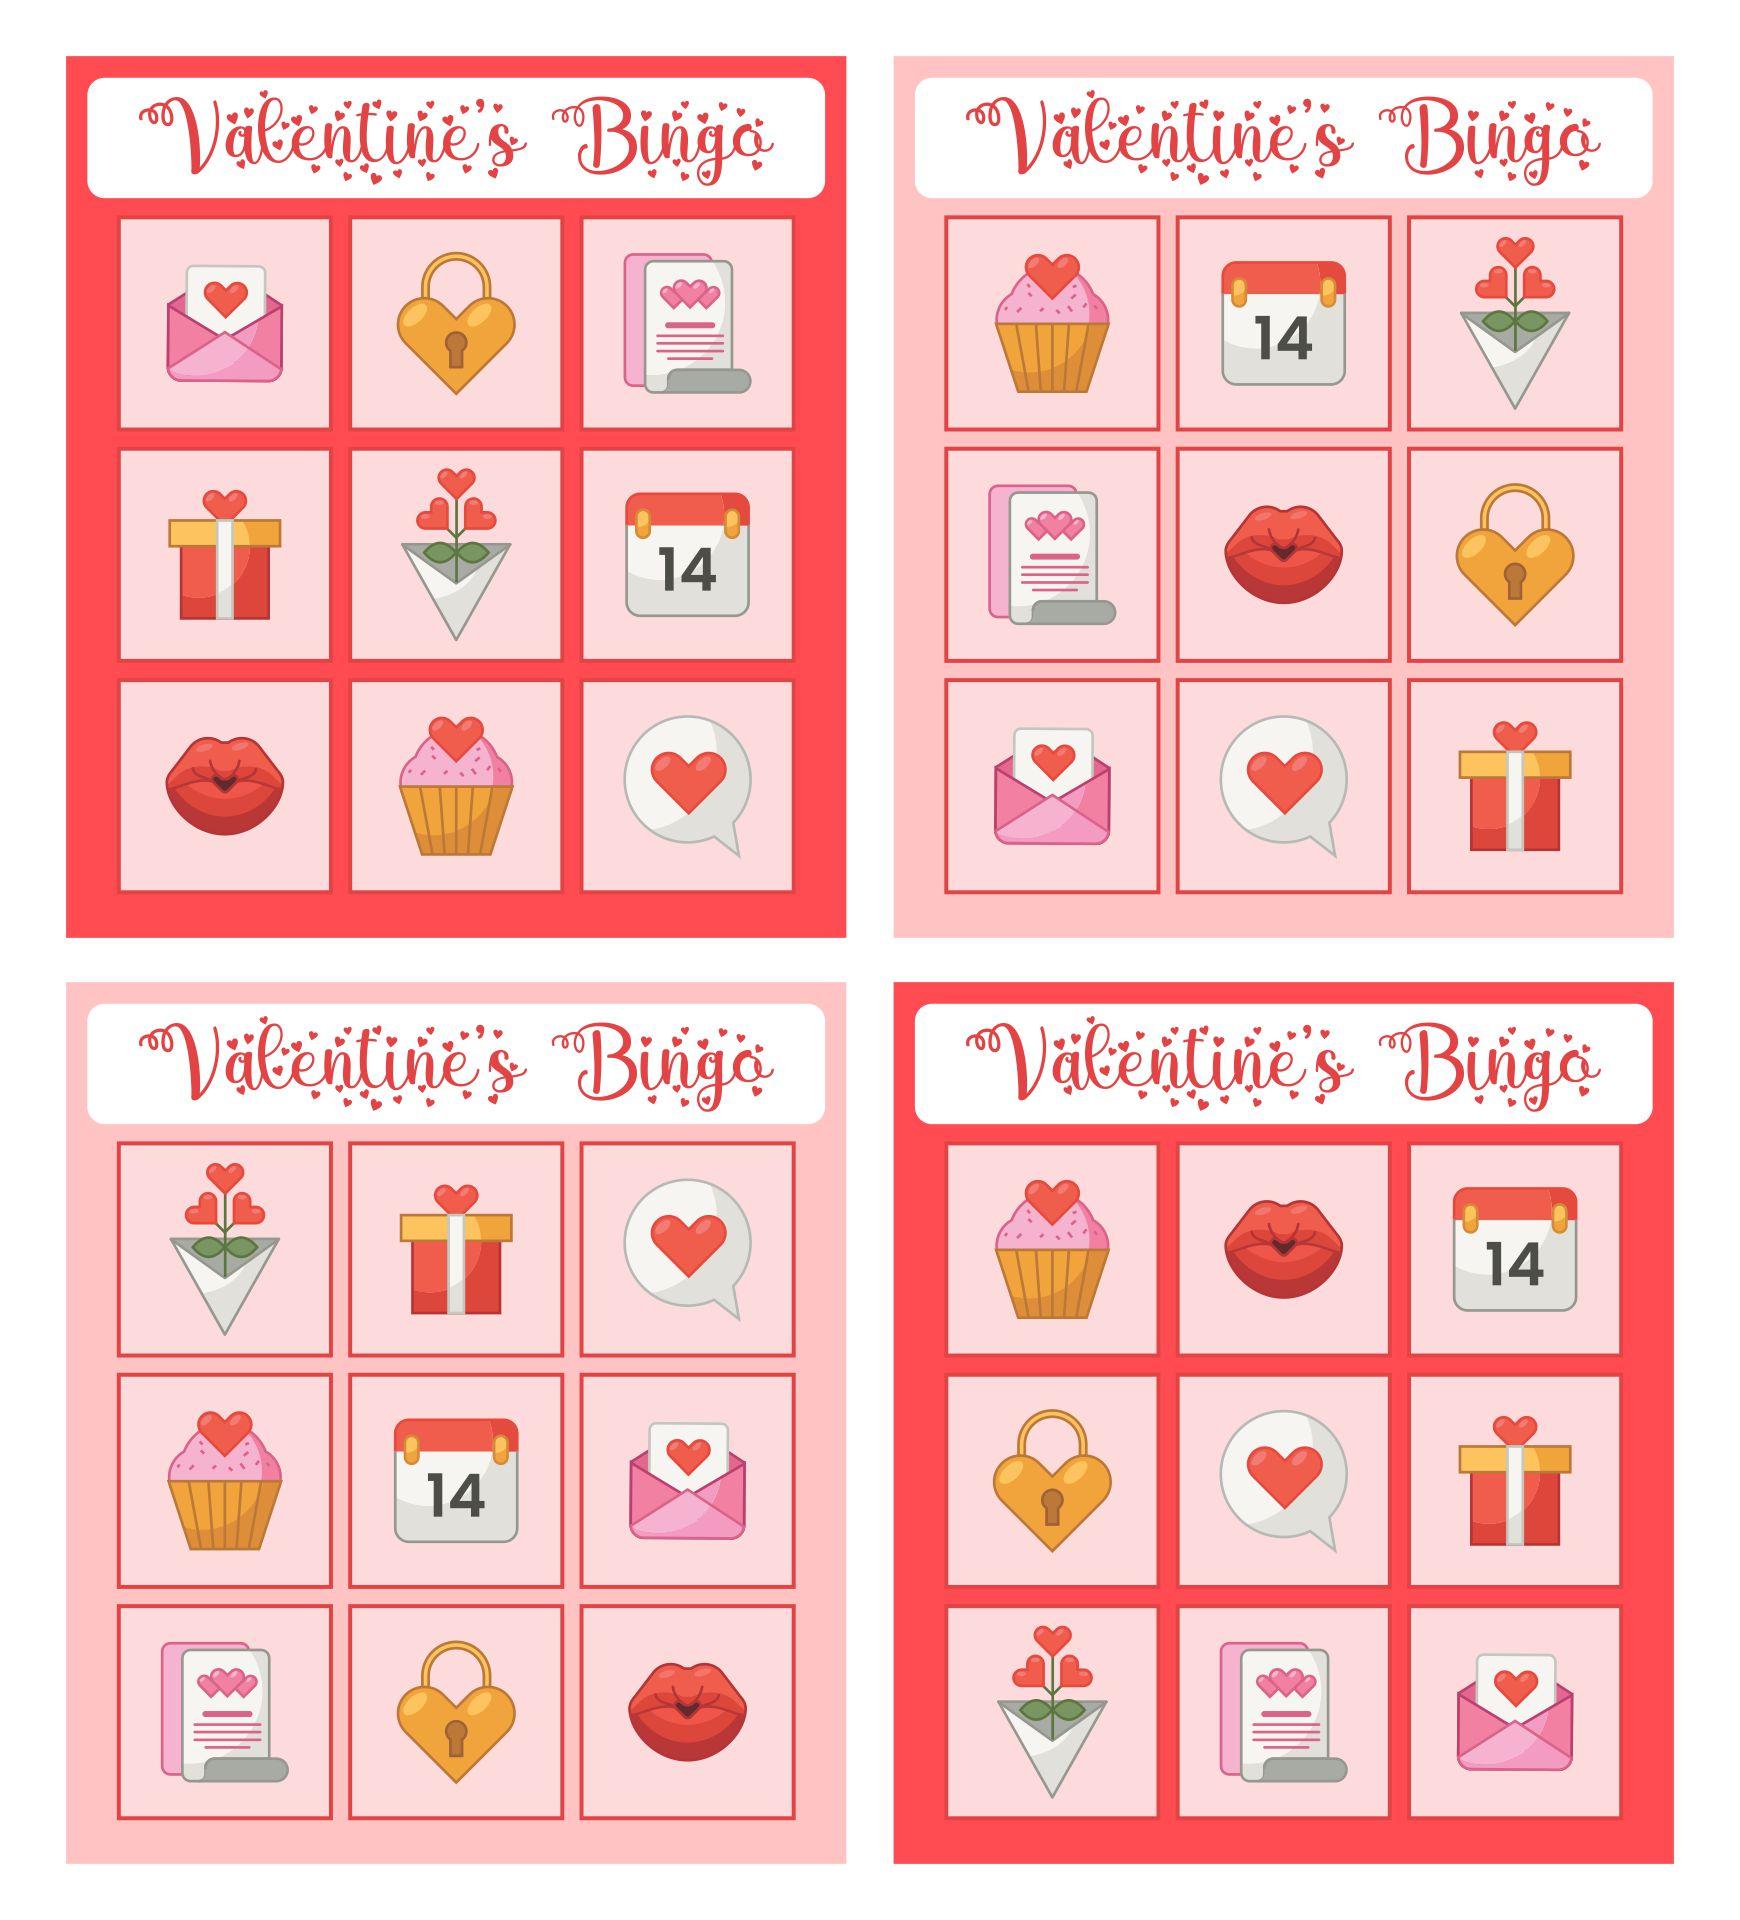 8 Images of Printable Blank Valentine's Day Bingo